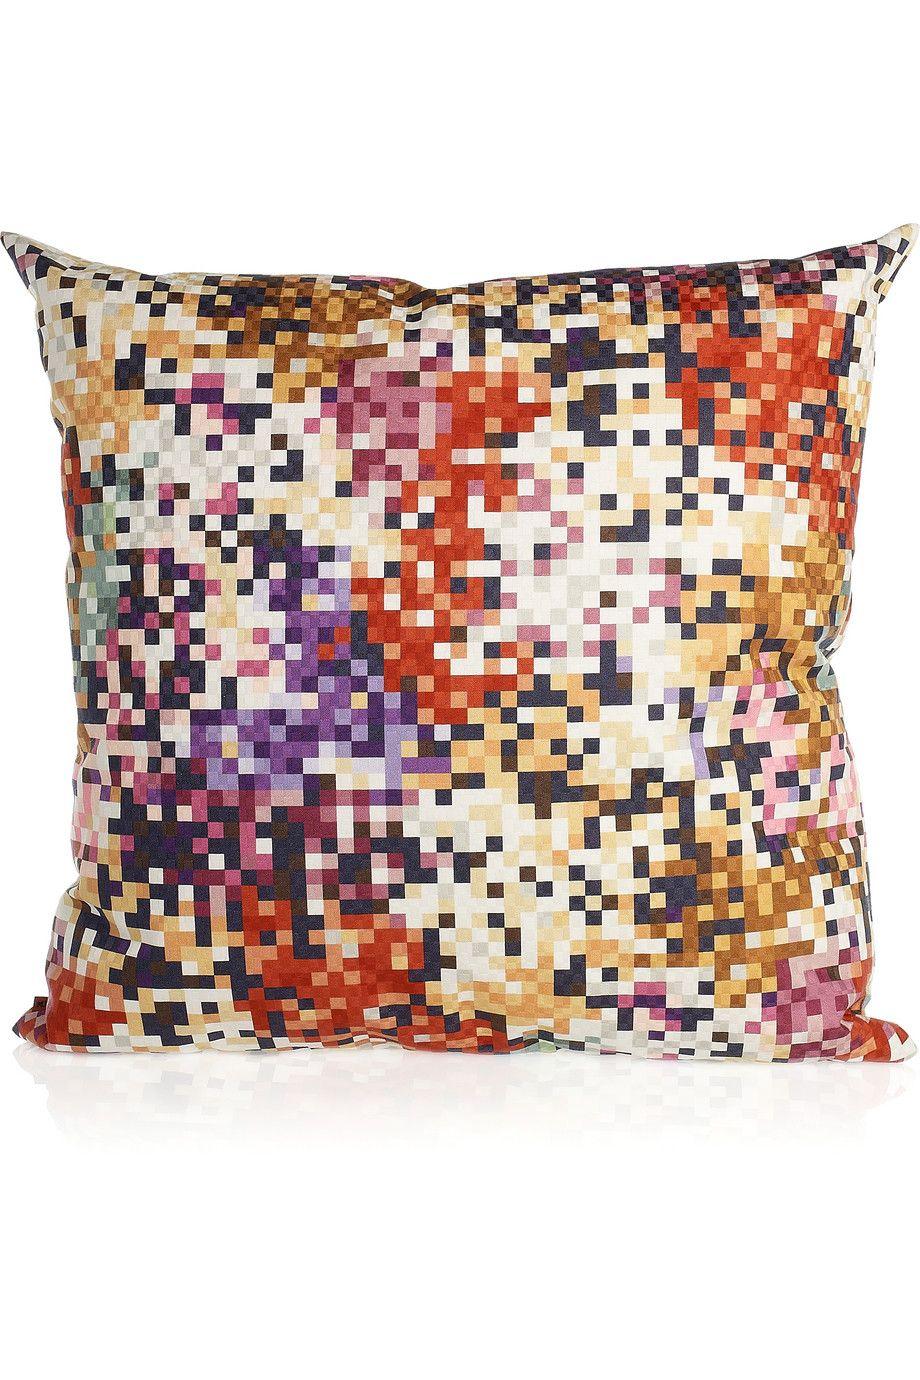 Missoni home lobos printed downfilled cushion uac pixelated